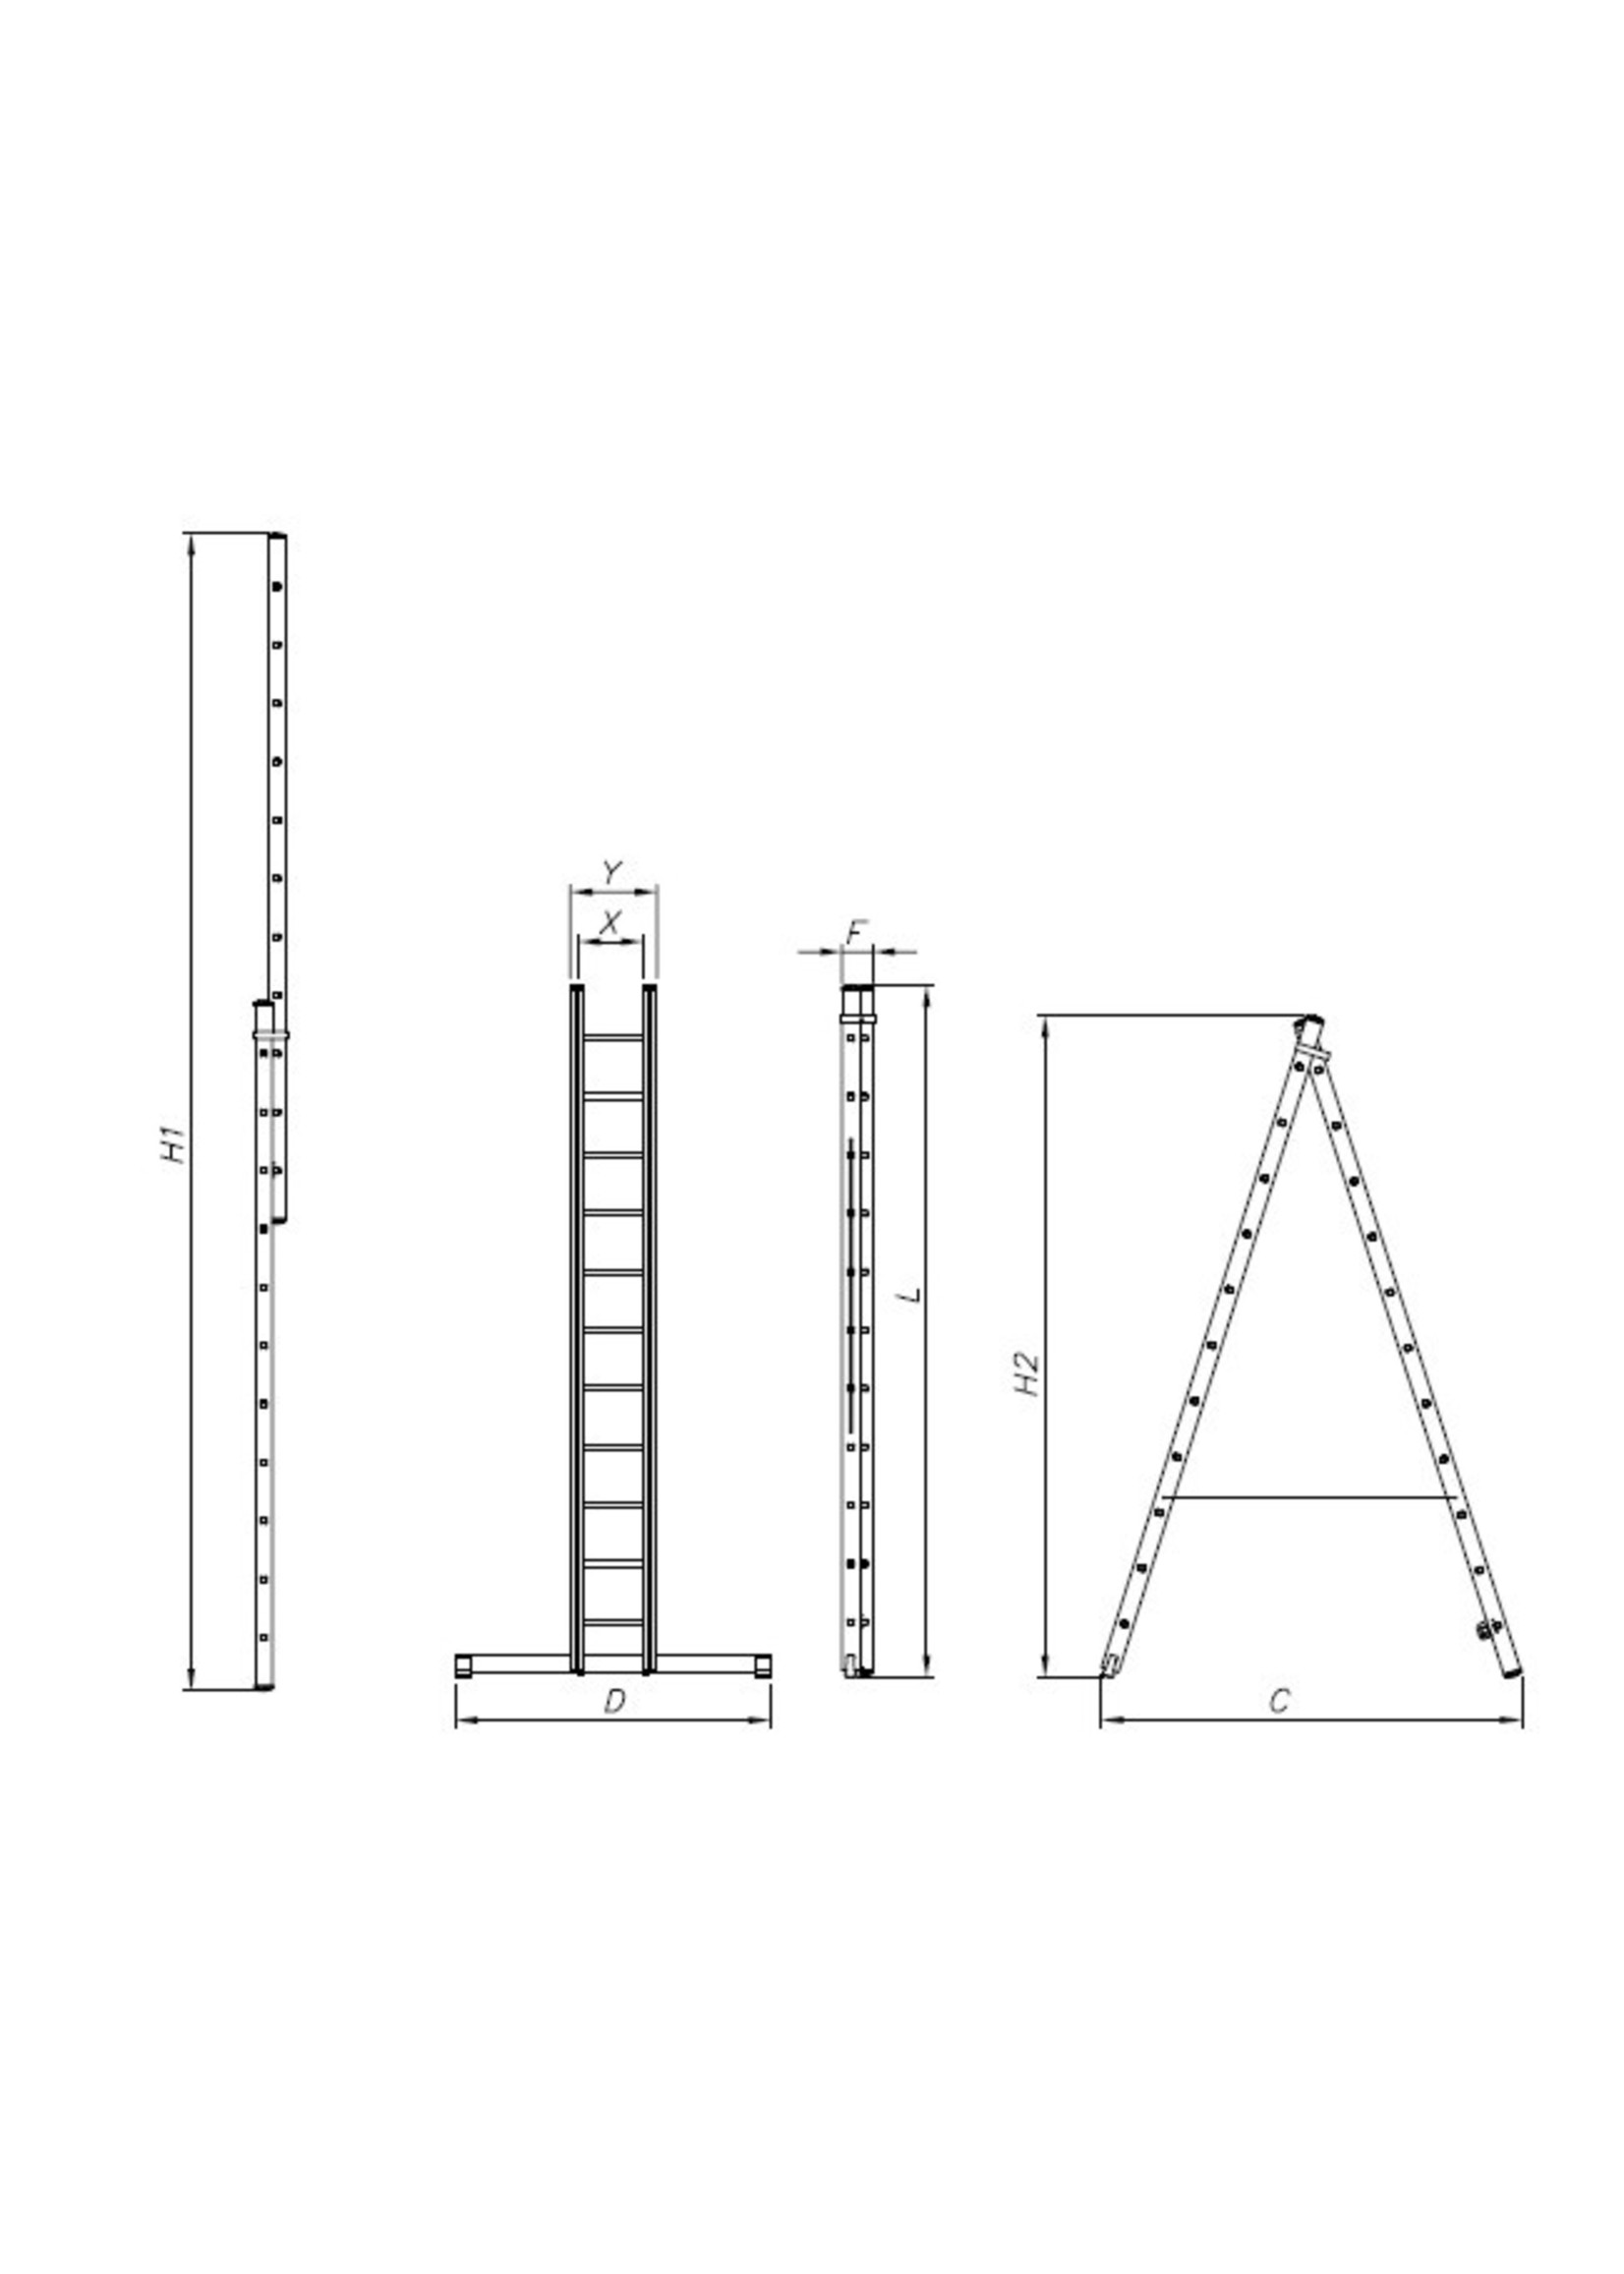 Spider & Co Aluminium opsteek- of uitzetladder professional 2 x 7 treden 197 x 40 cm  EN131 tot 150 kg